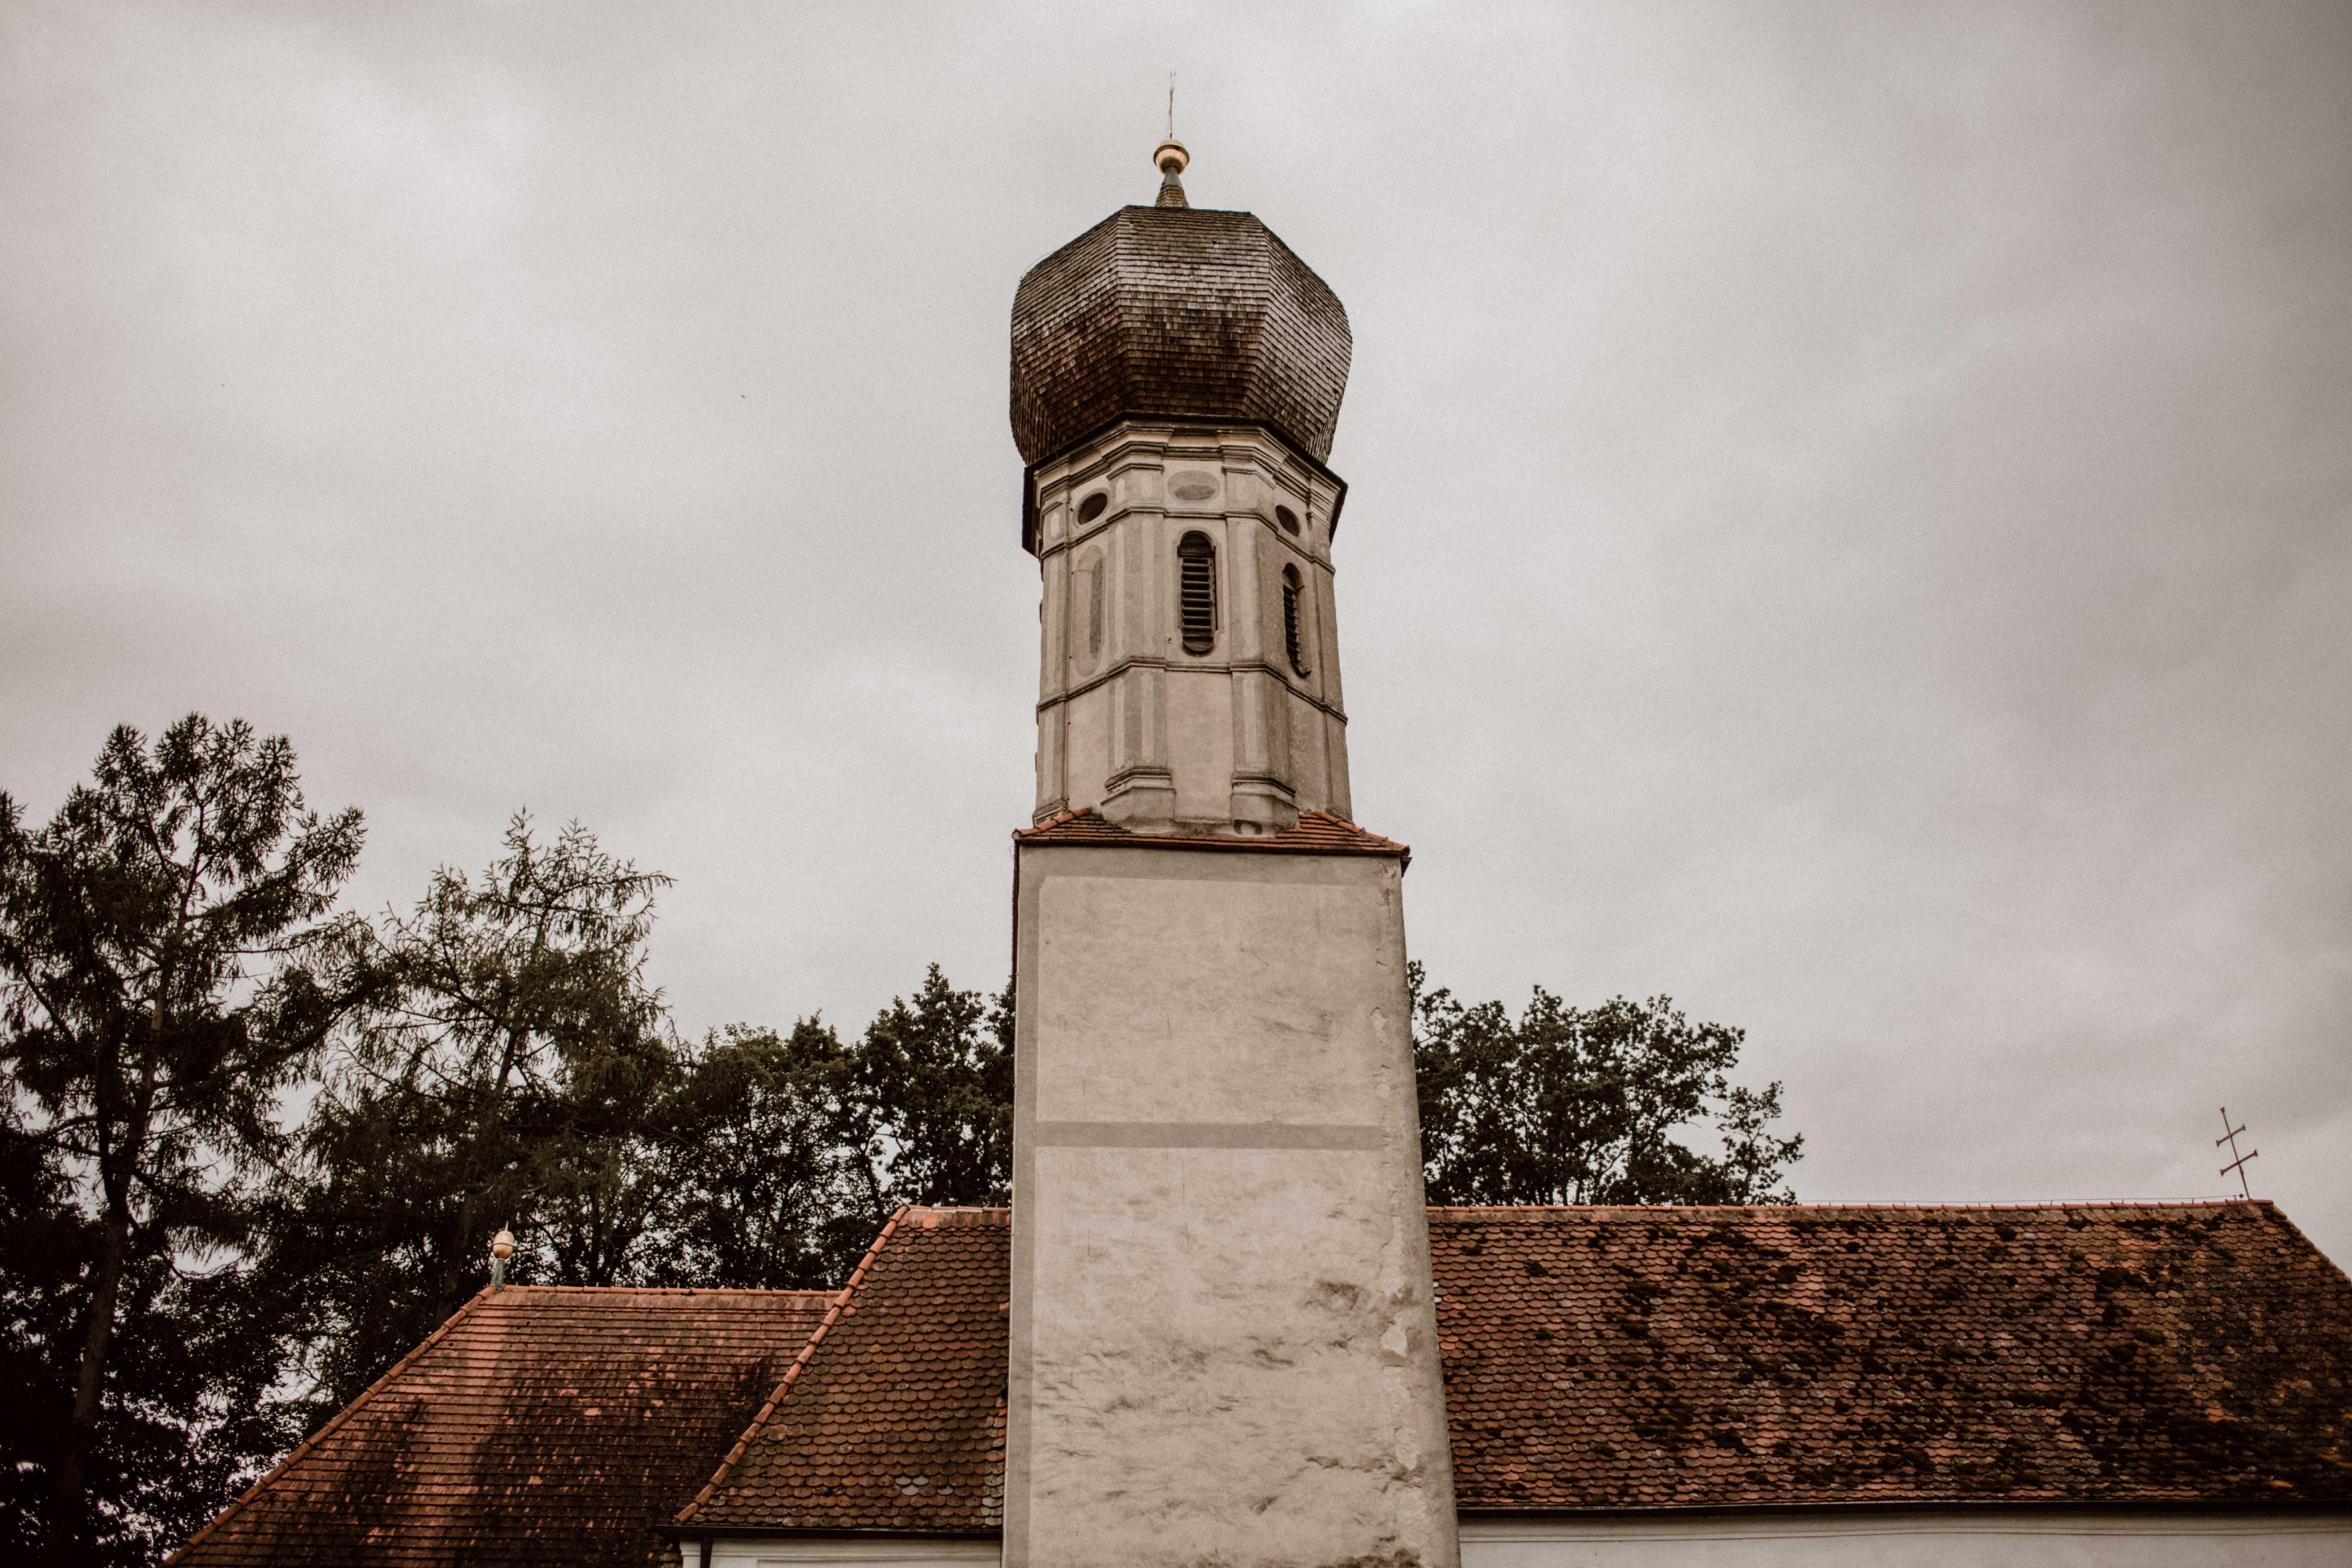 kirche glockenturm sonja poehlmann photography couples muenchen bayern